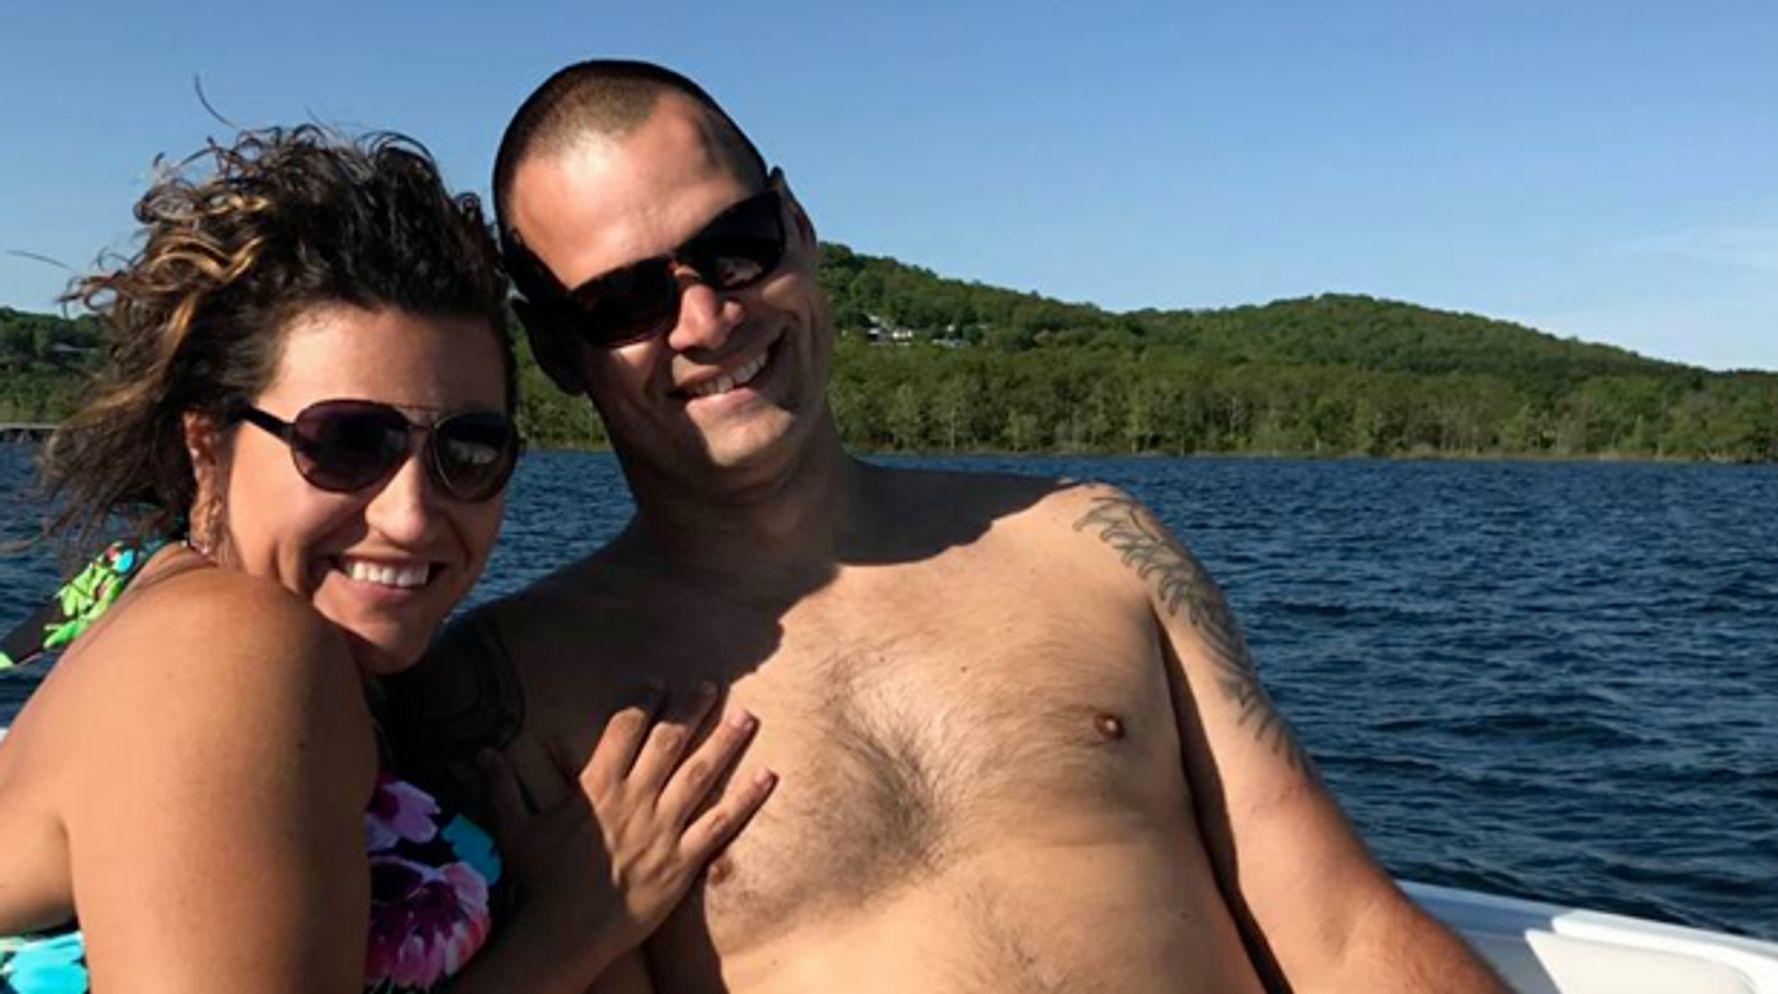 Couple's Holiday Photo Creates A Hilariously Rude Optical Illusion